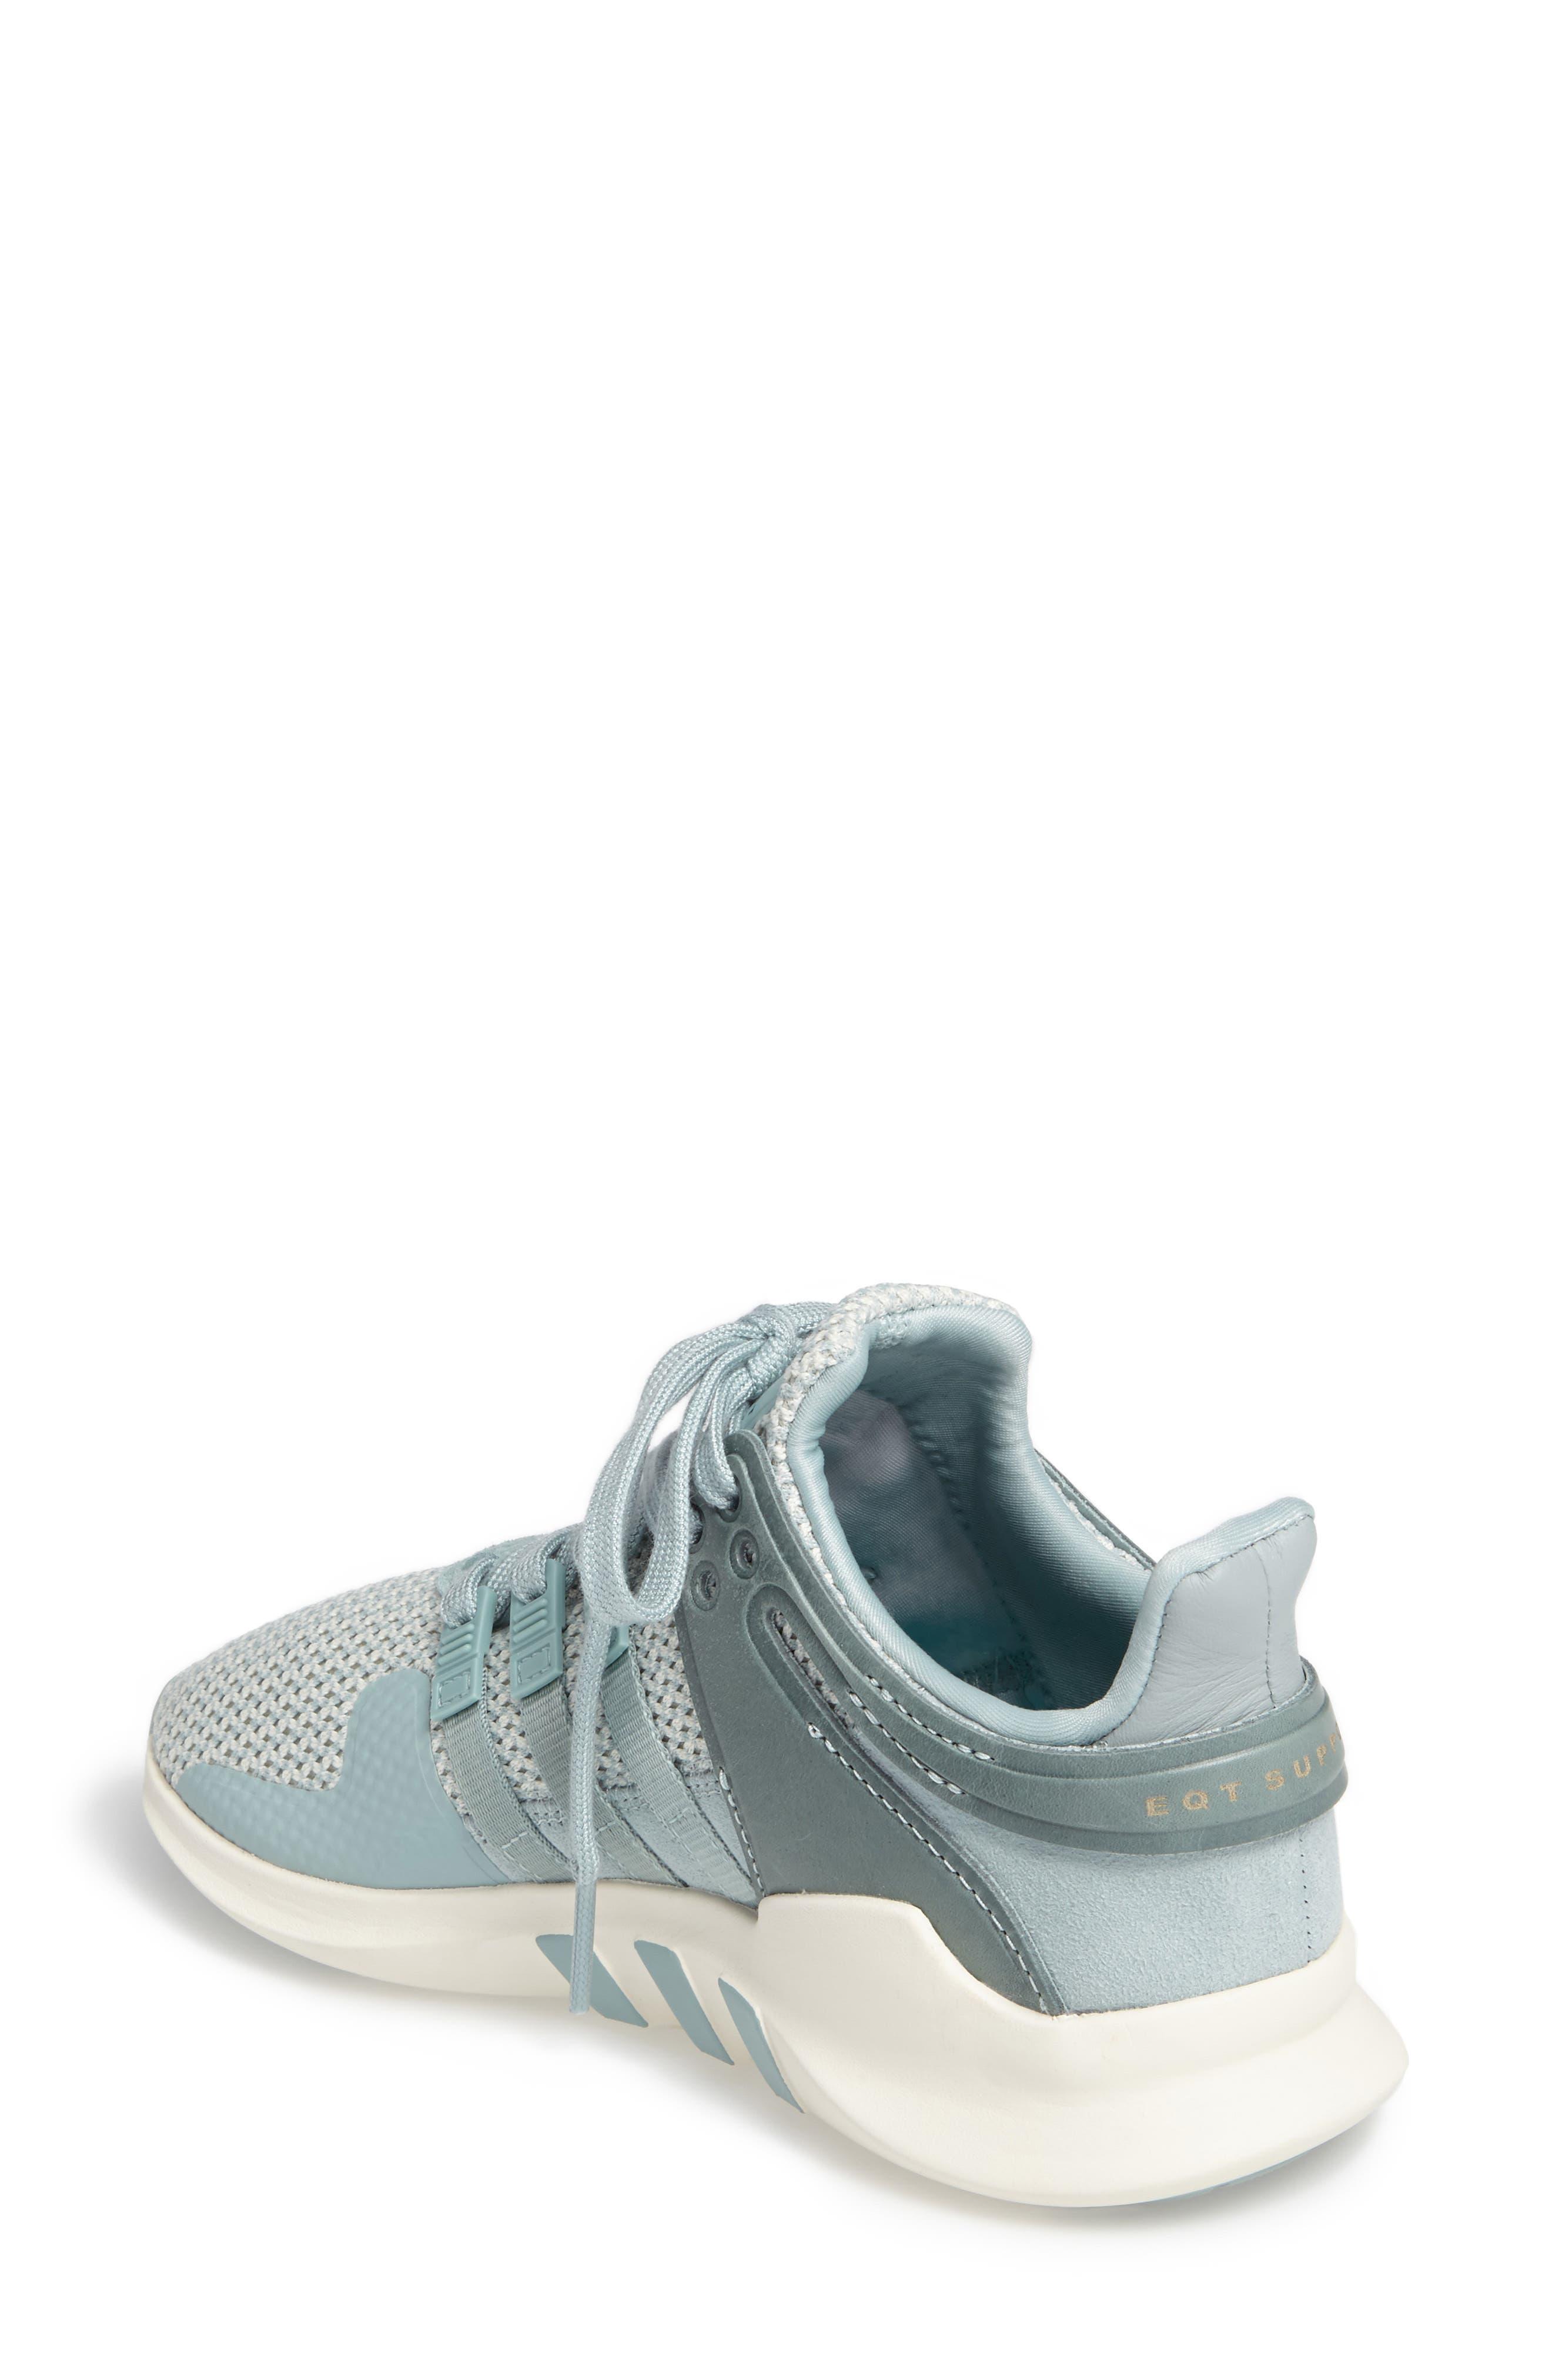 EQT Support Adv Sneaker,                             Alternate thumbnail 21, color,